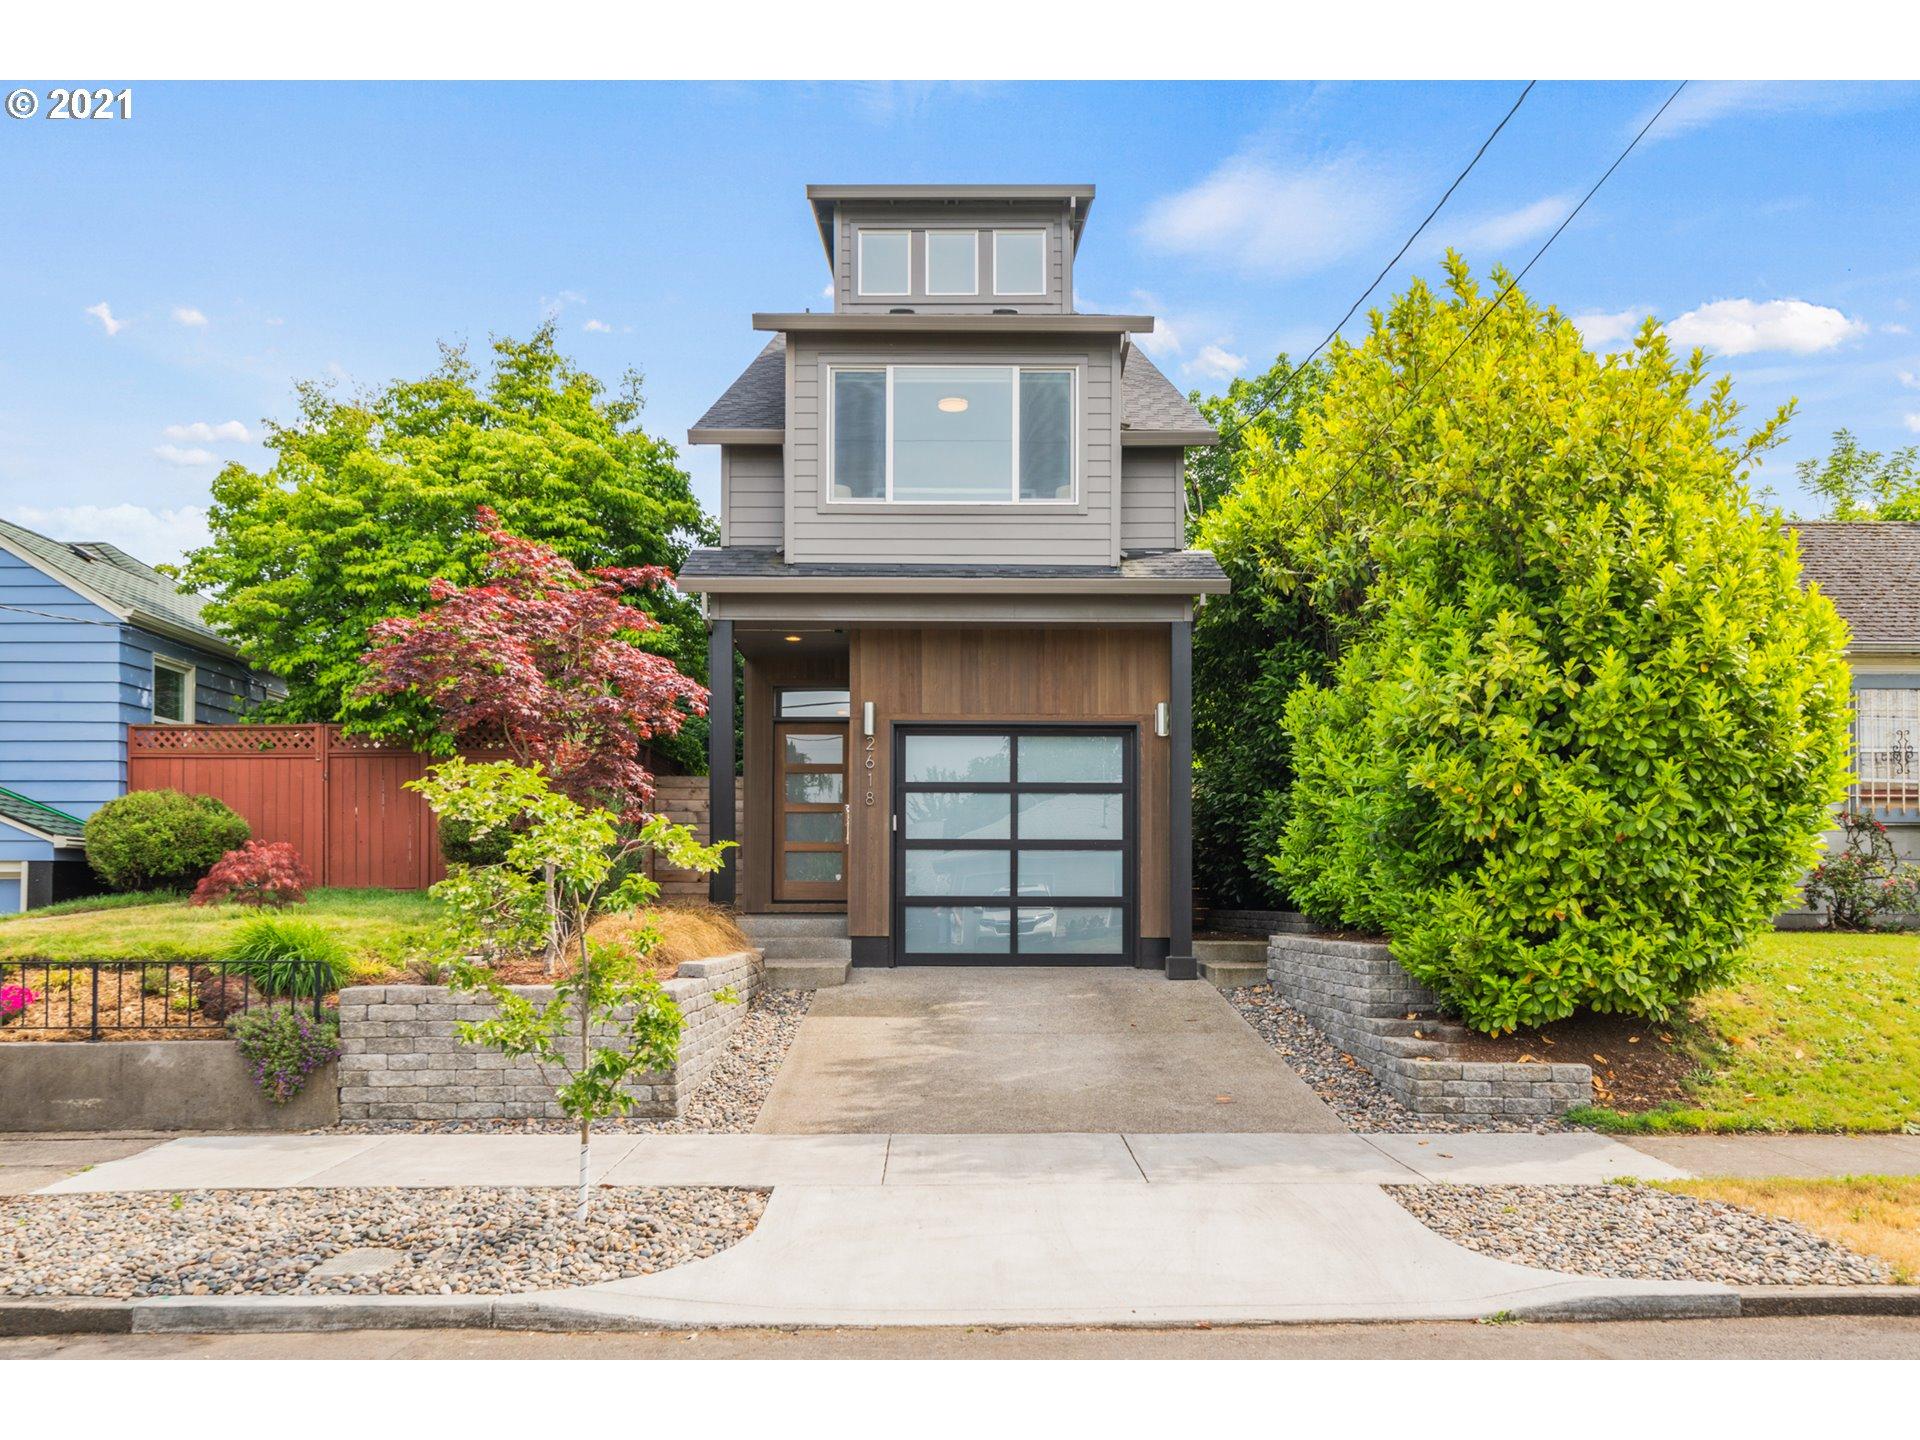 2618 N BALDWIN ST, Portland OR 97217